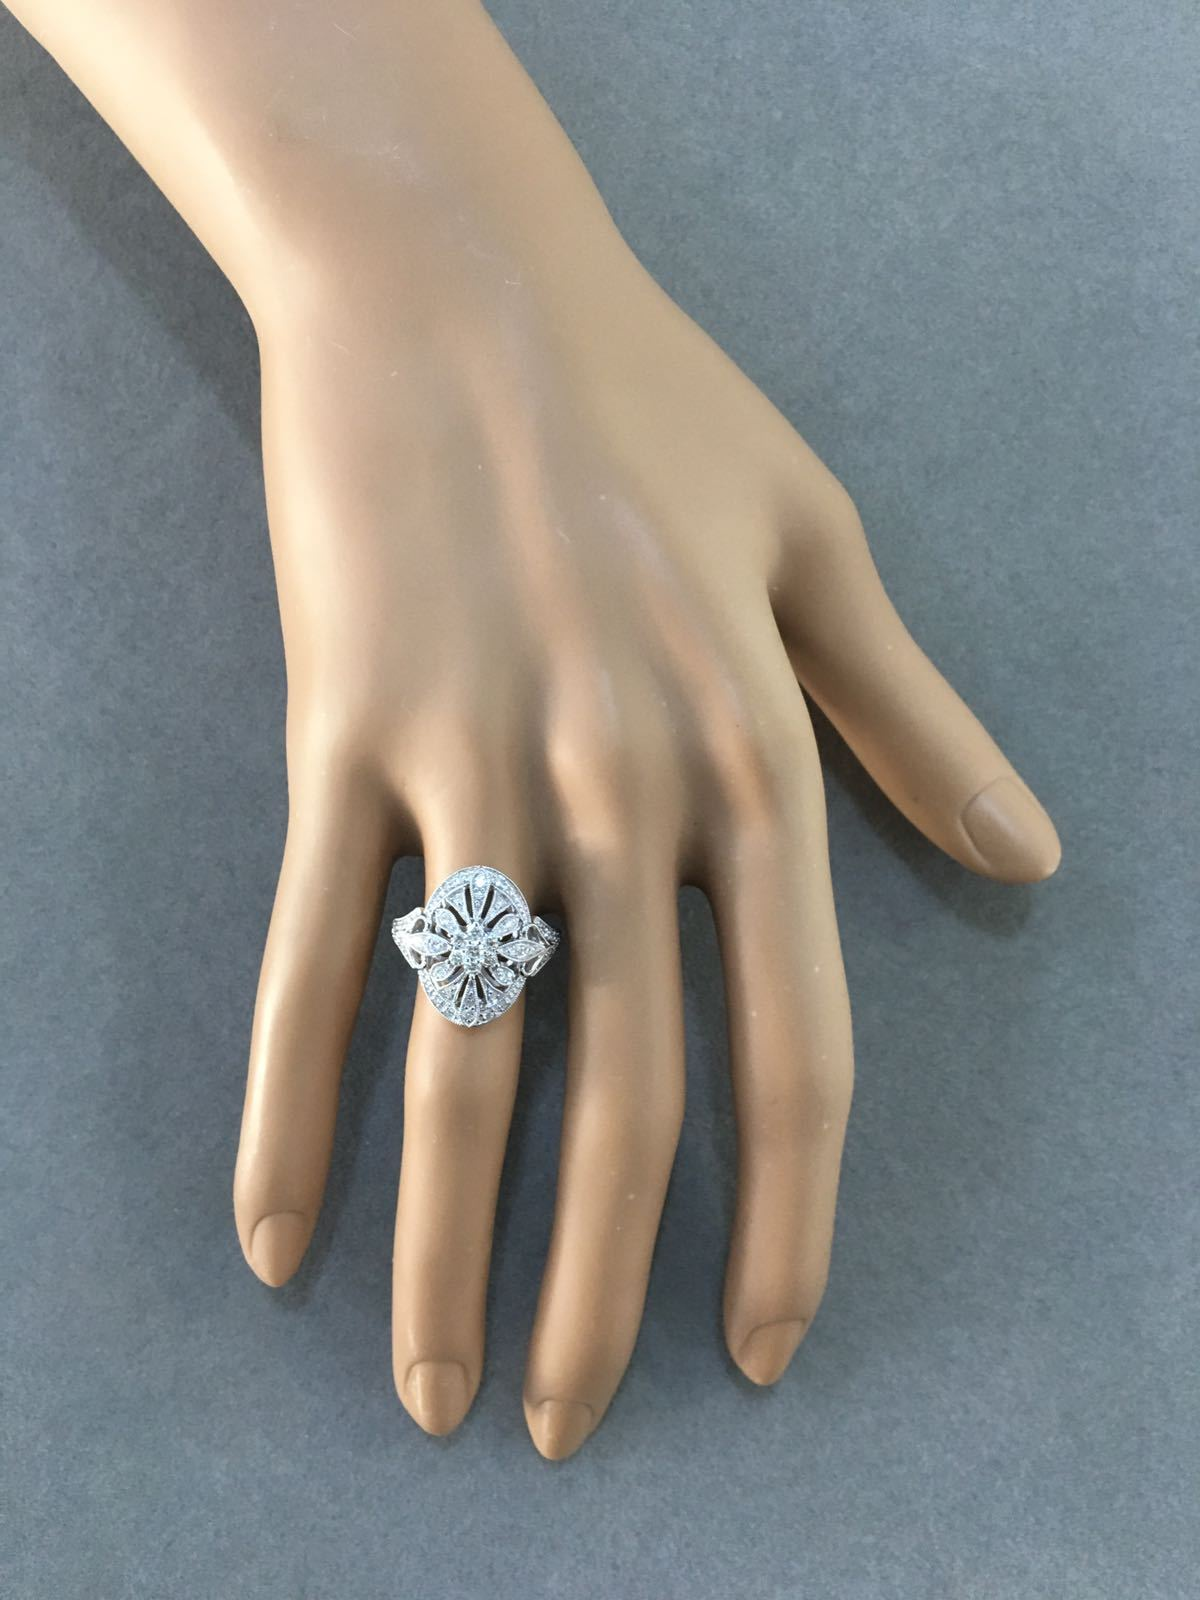 Oval Shaped Art-Deco Style Diamond Ring